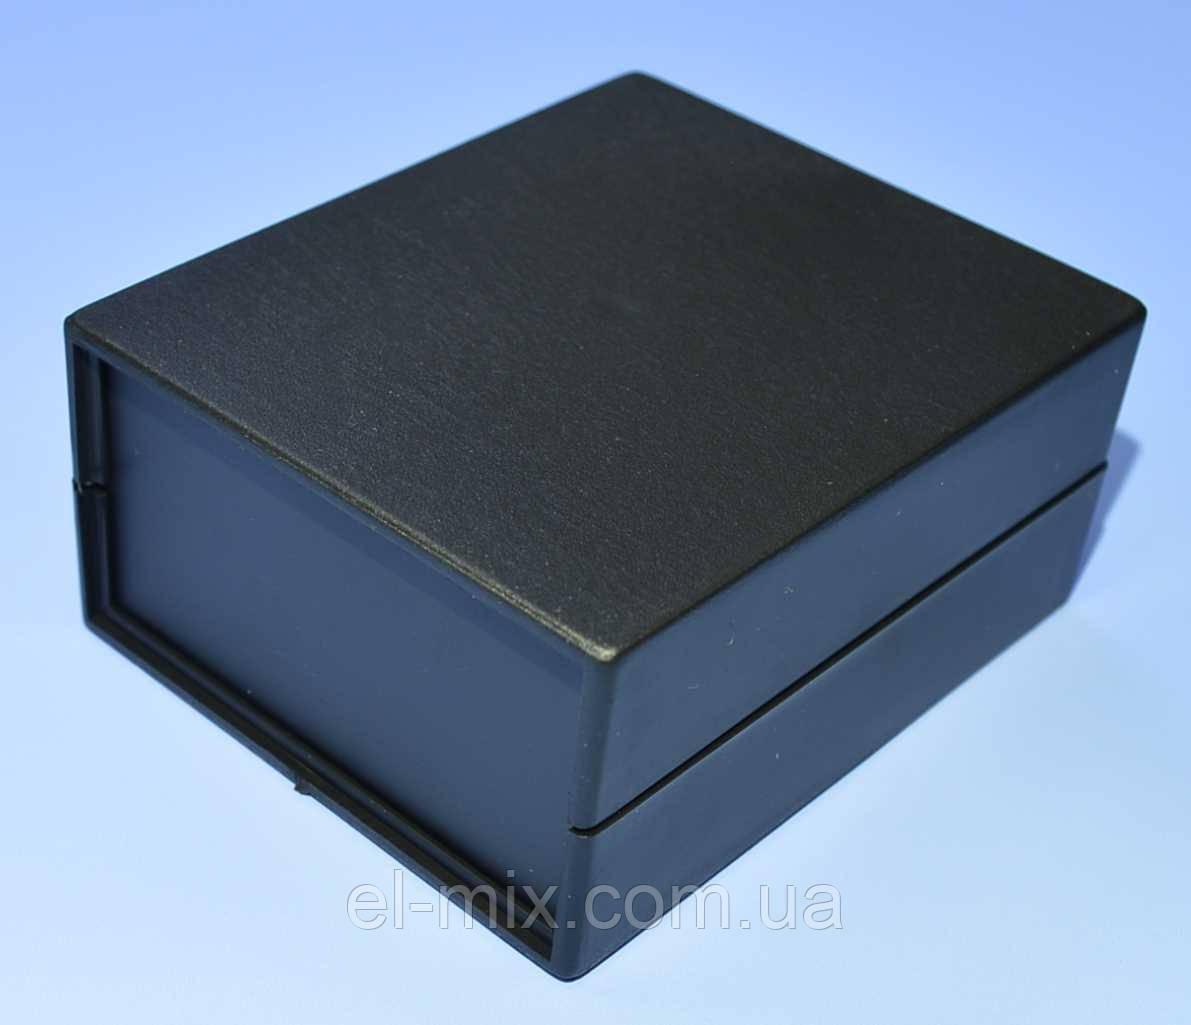 Корпус пластмассовый   Z-5A  90х110х49 (ш*д*в)  Kradex